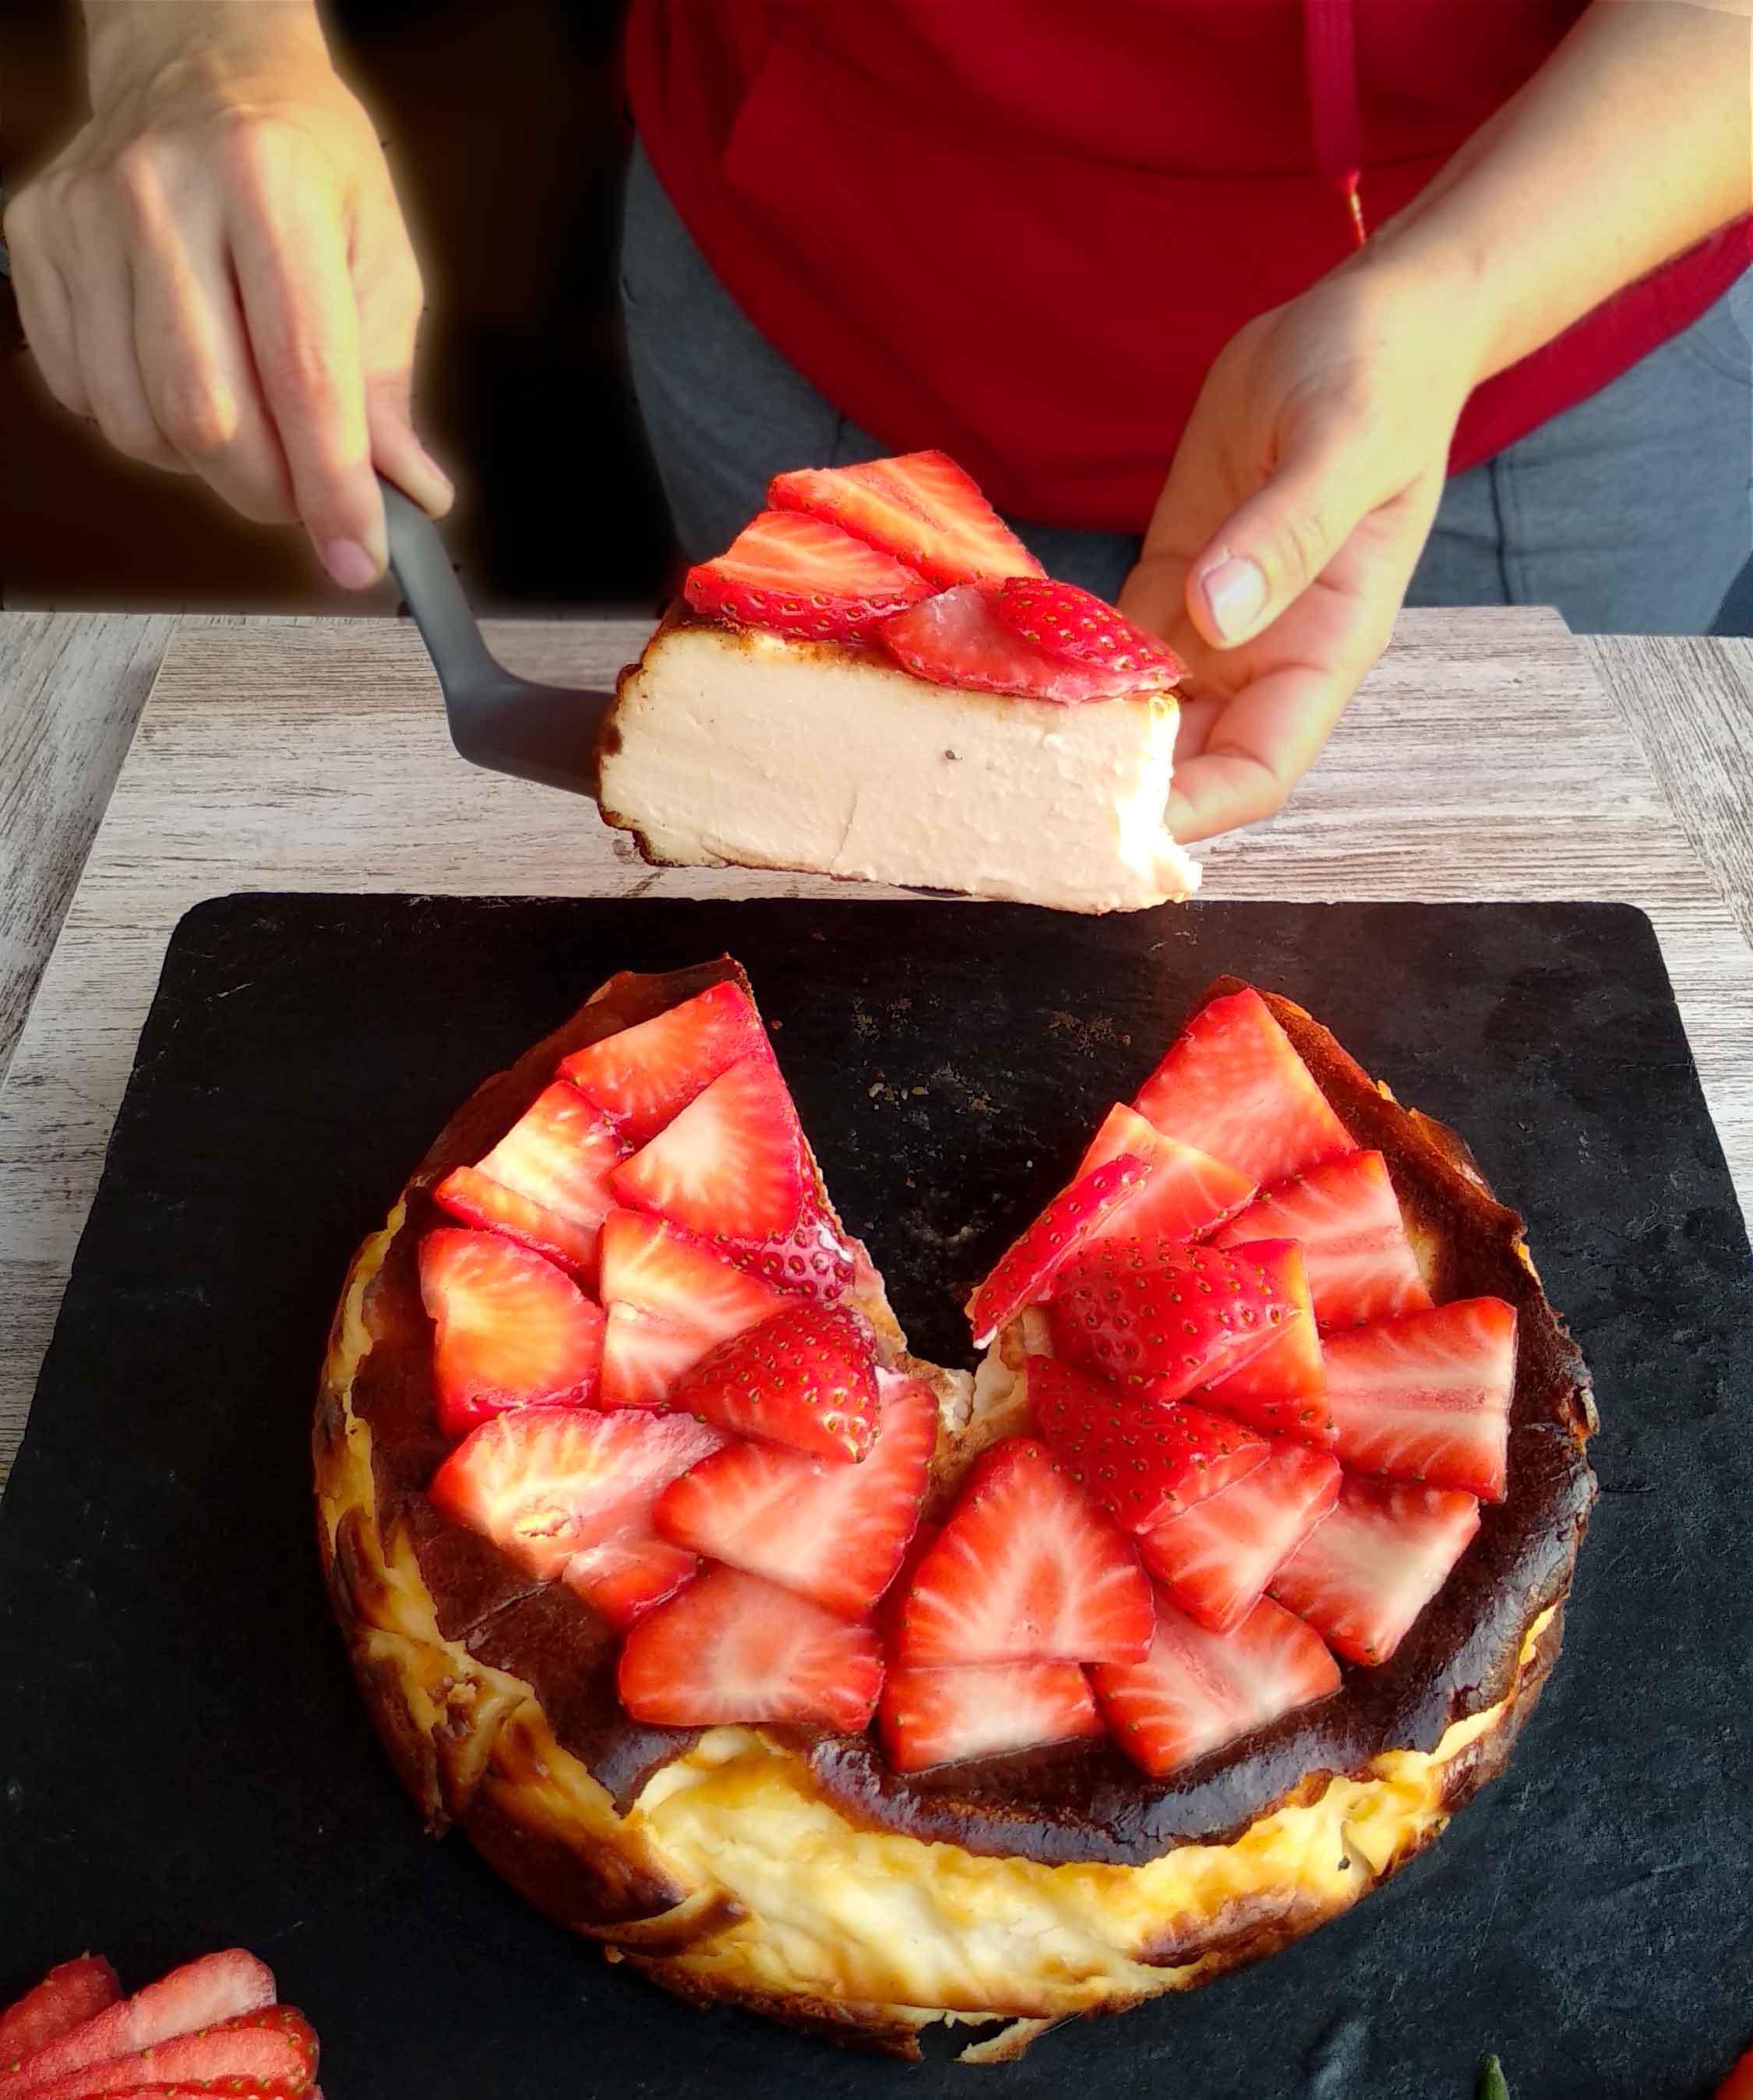 com fer pastís de formatge